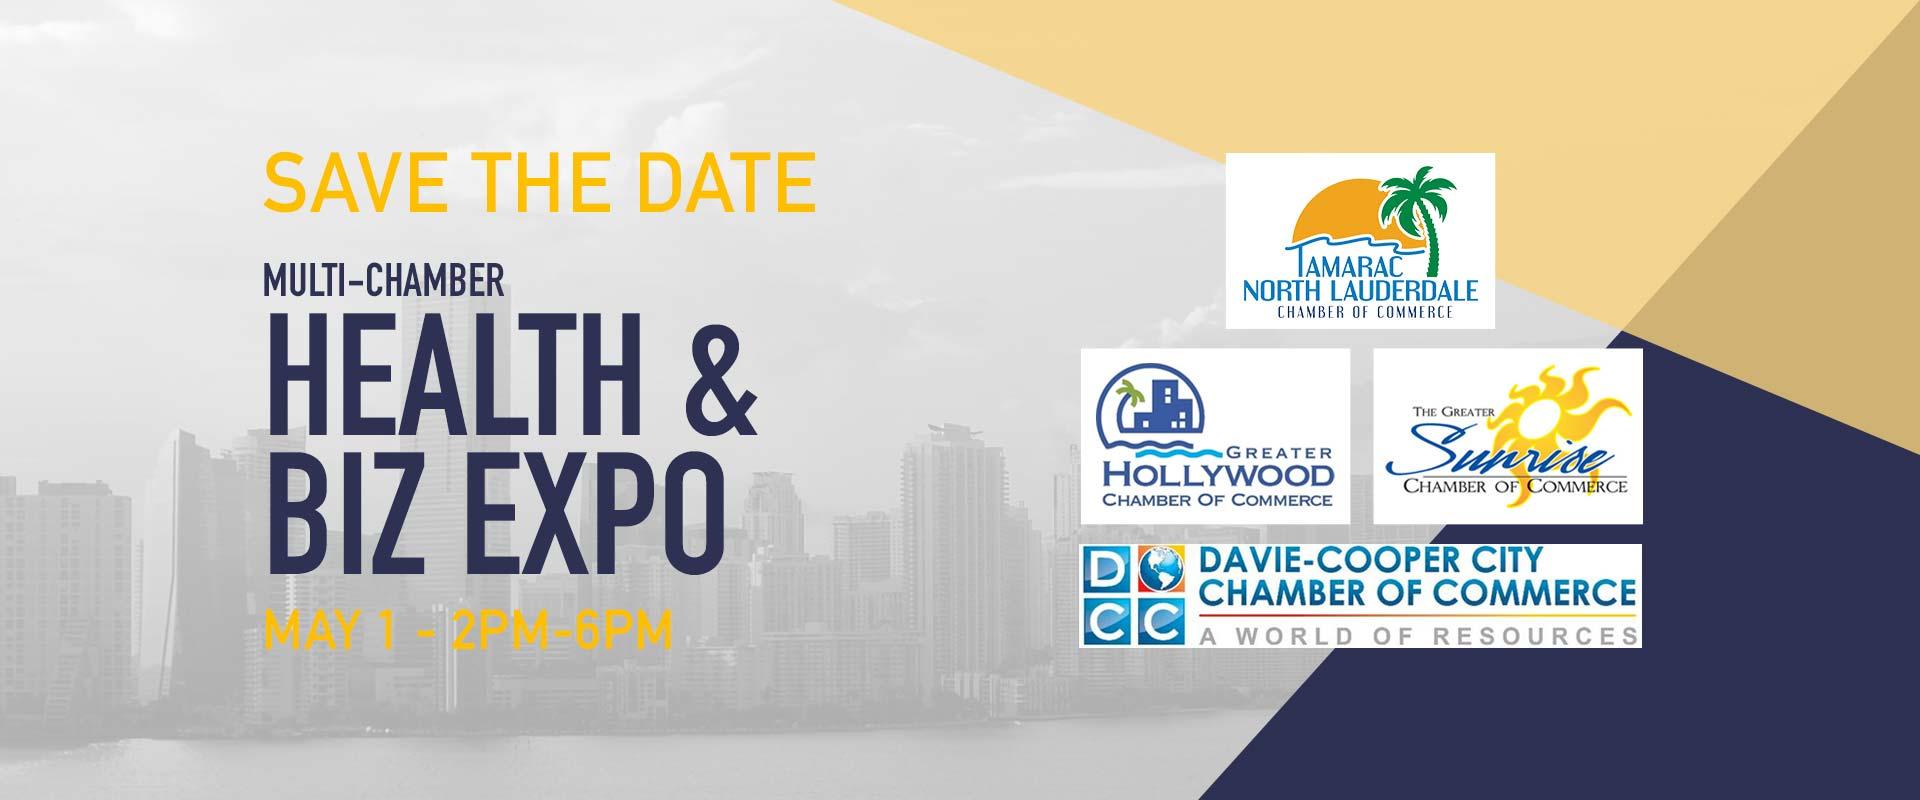 multi-chamber-health-biz-expo